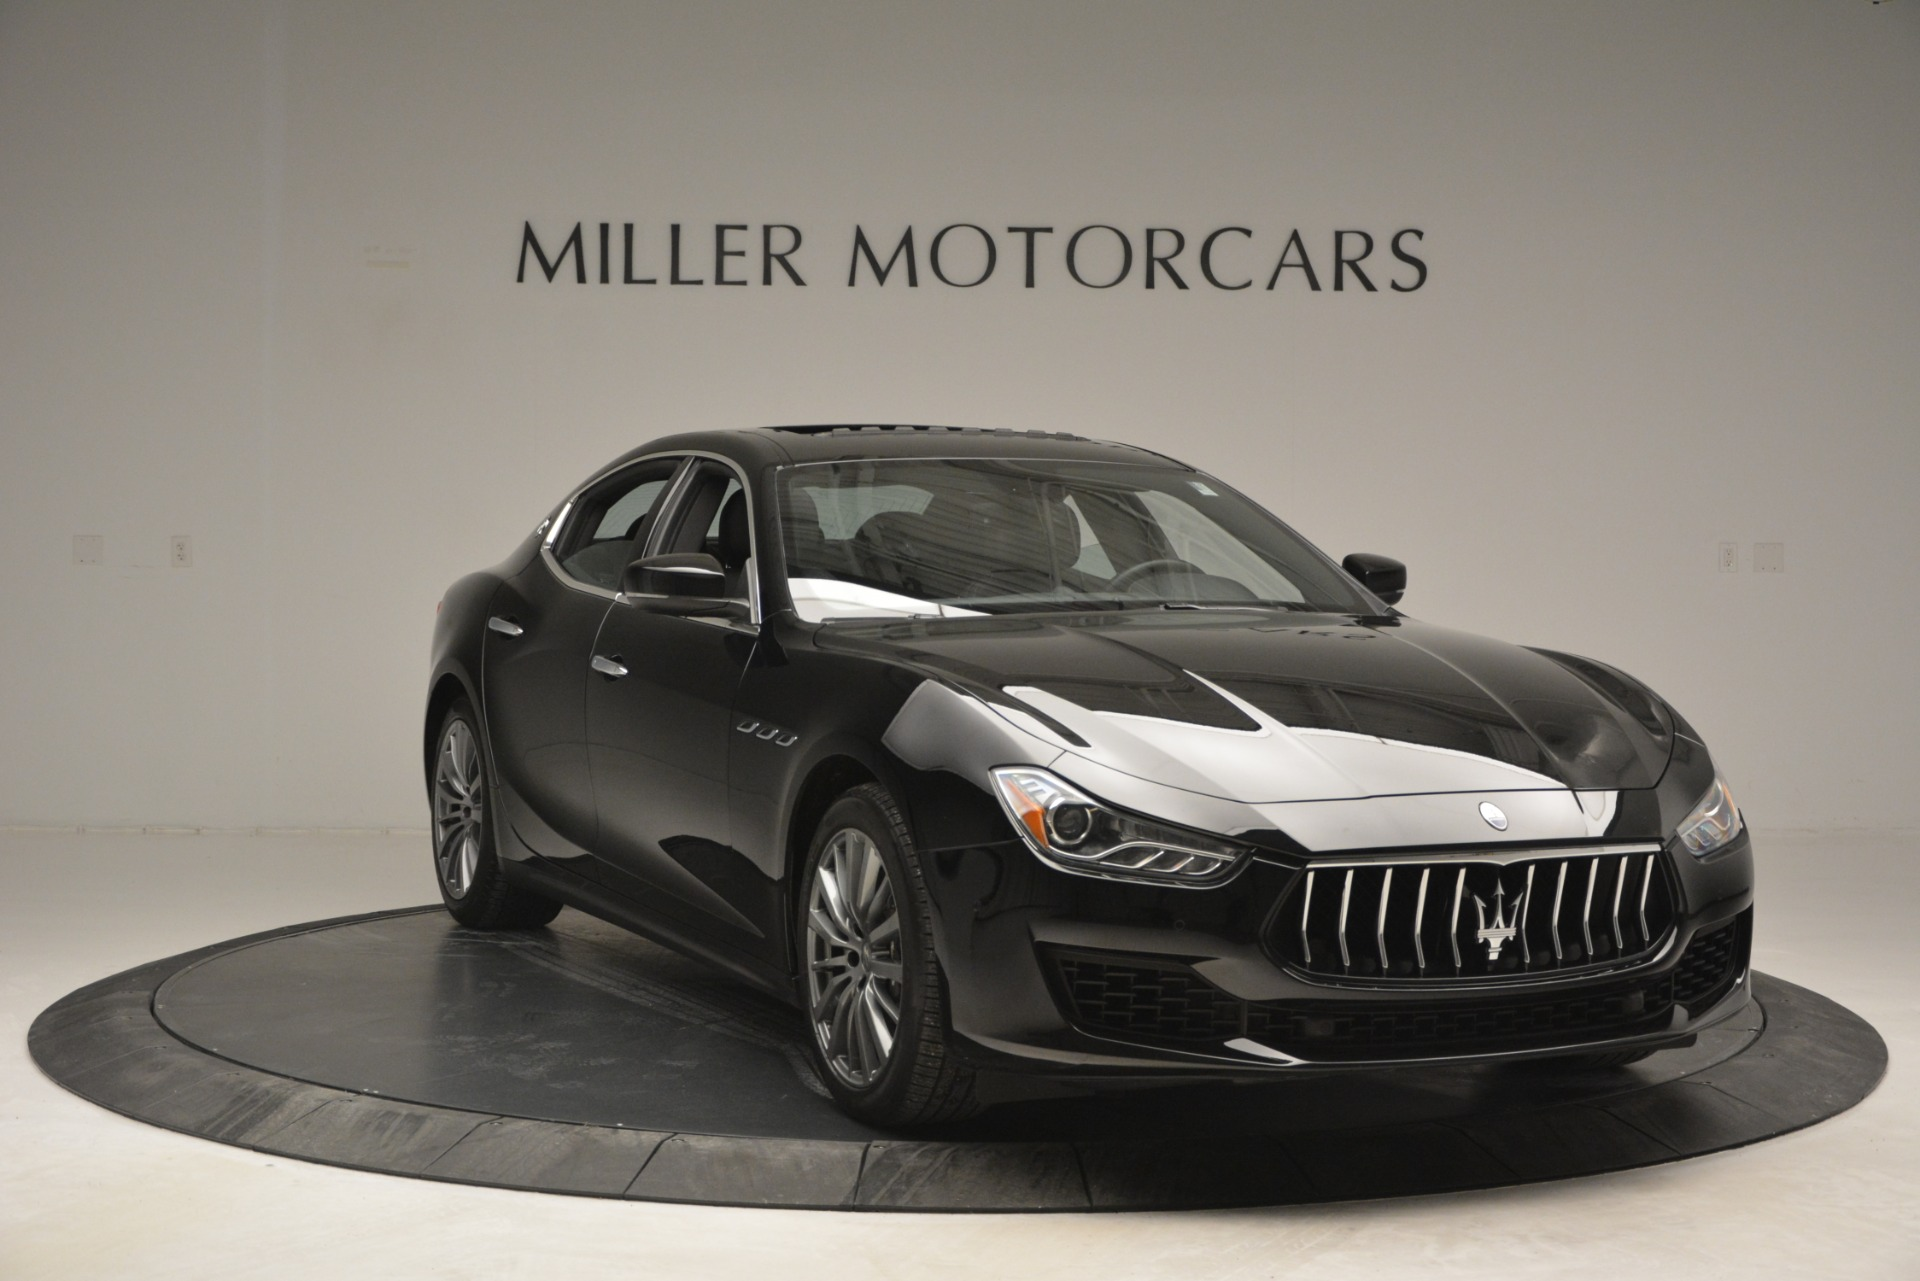 Used 2018 Maserati Ghibli S Q4 For Sale 58900 In Greenwich, CT